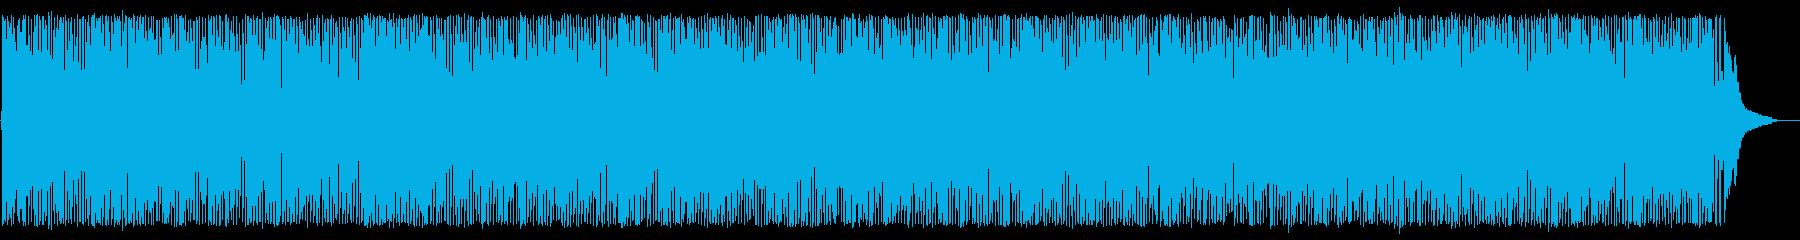 G線上のアリア(acoustic)の再生済みの波形